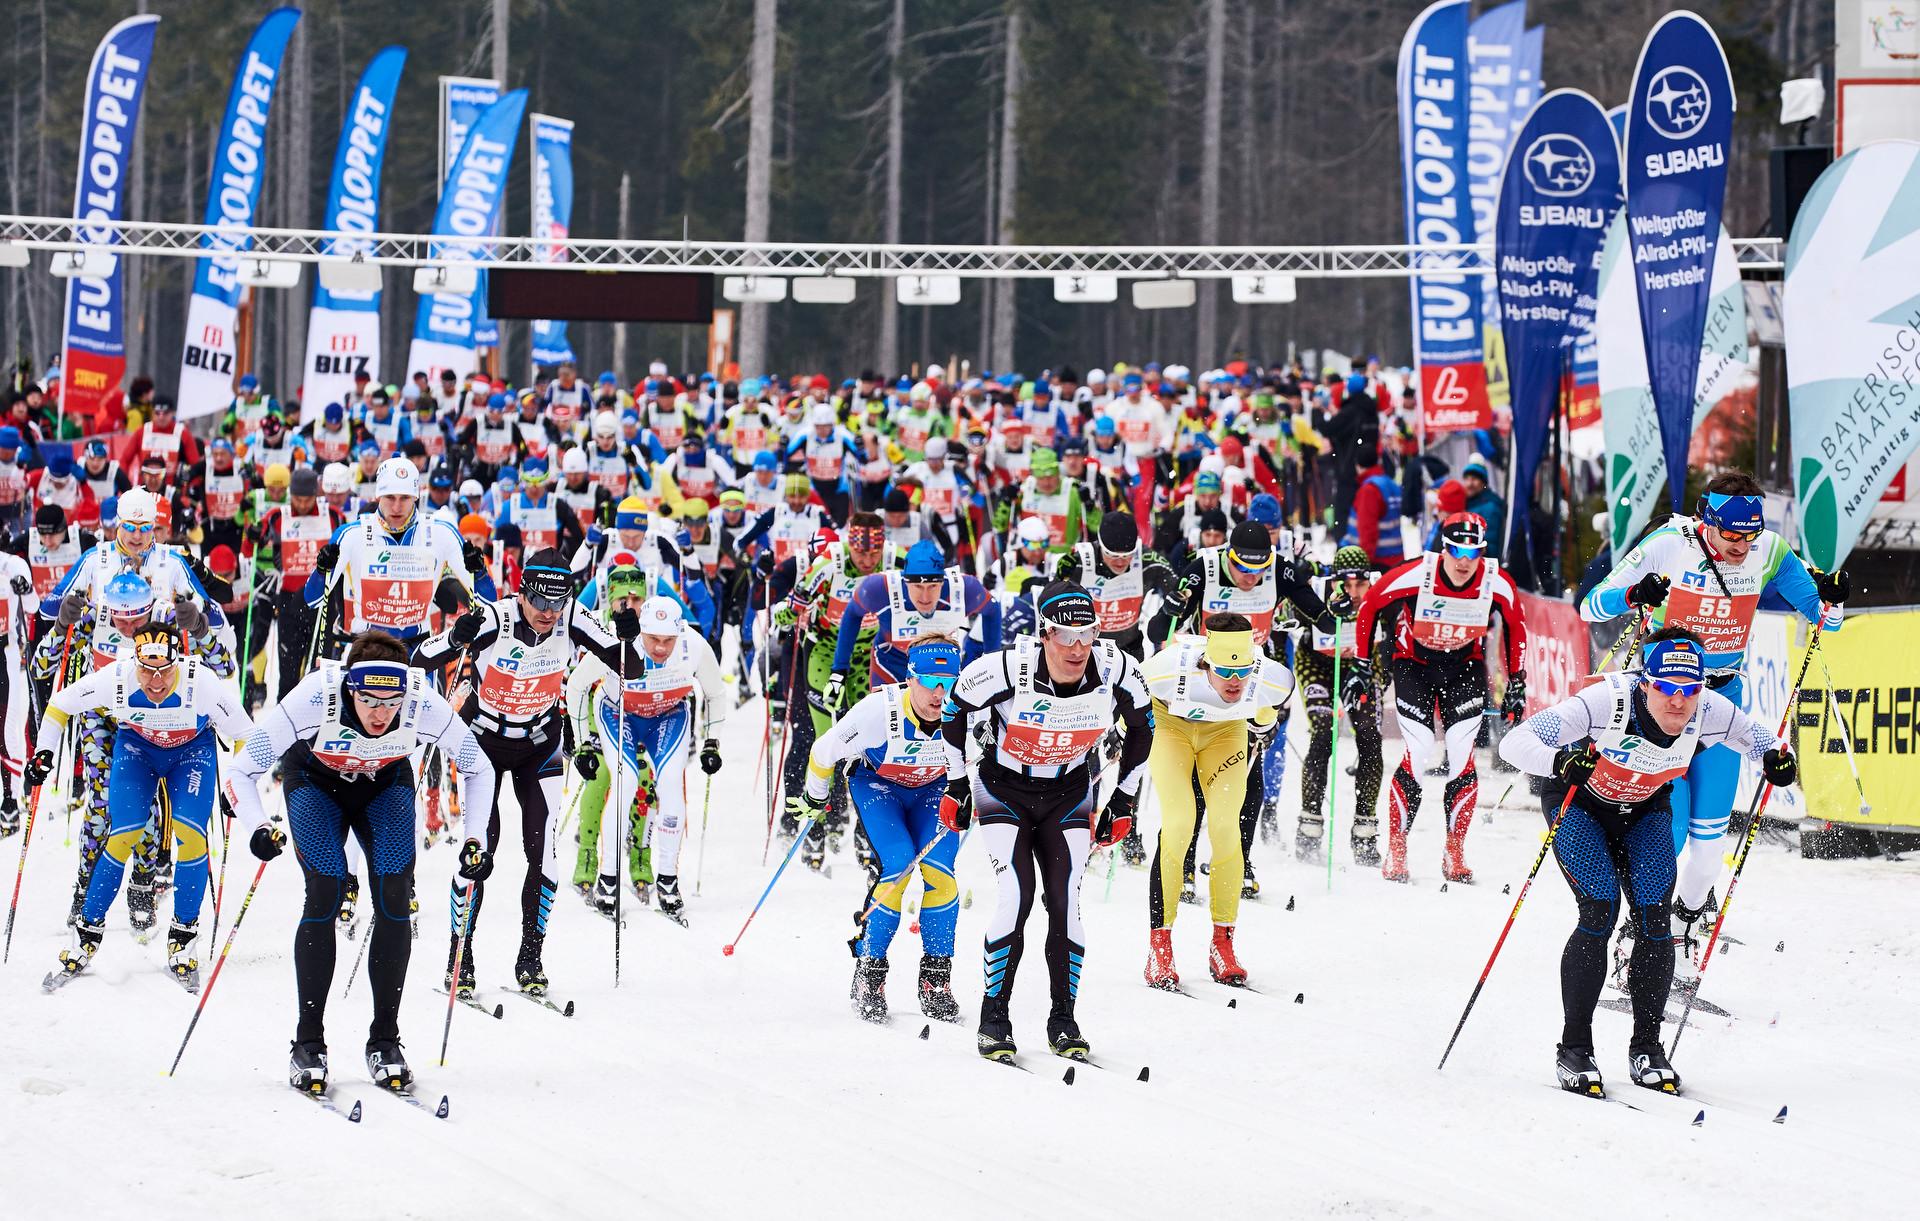 Skadi Loppet Bodenmais Auf Geht S Zum Saisonfinale Xc Ski De